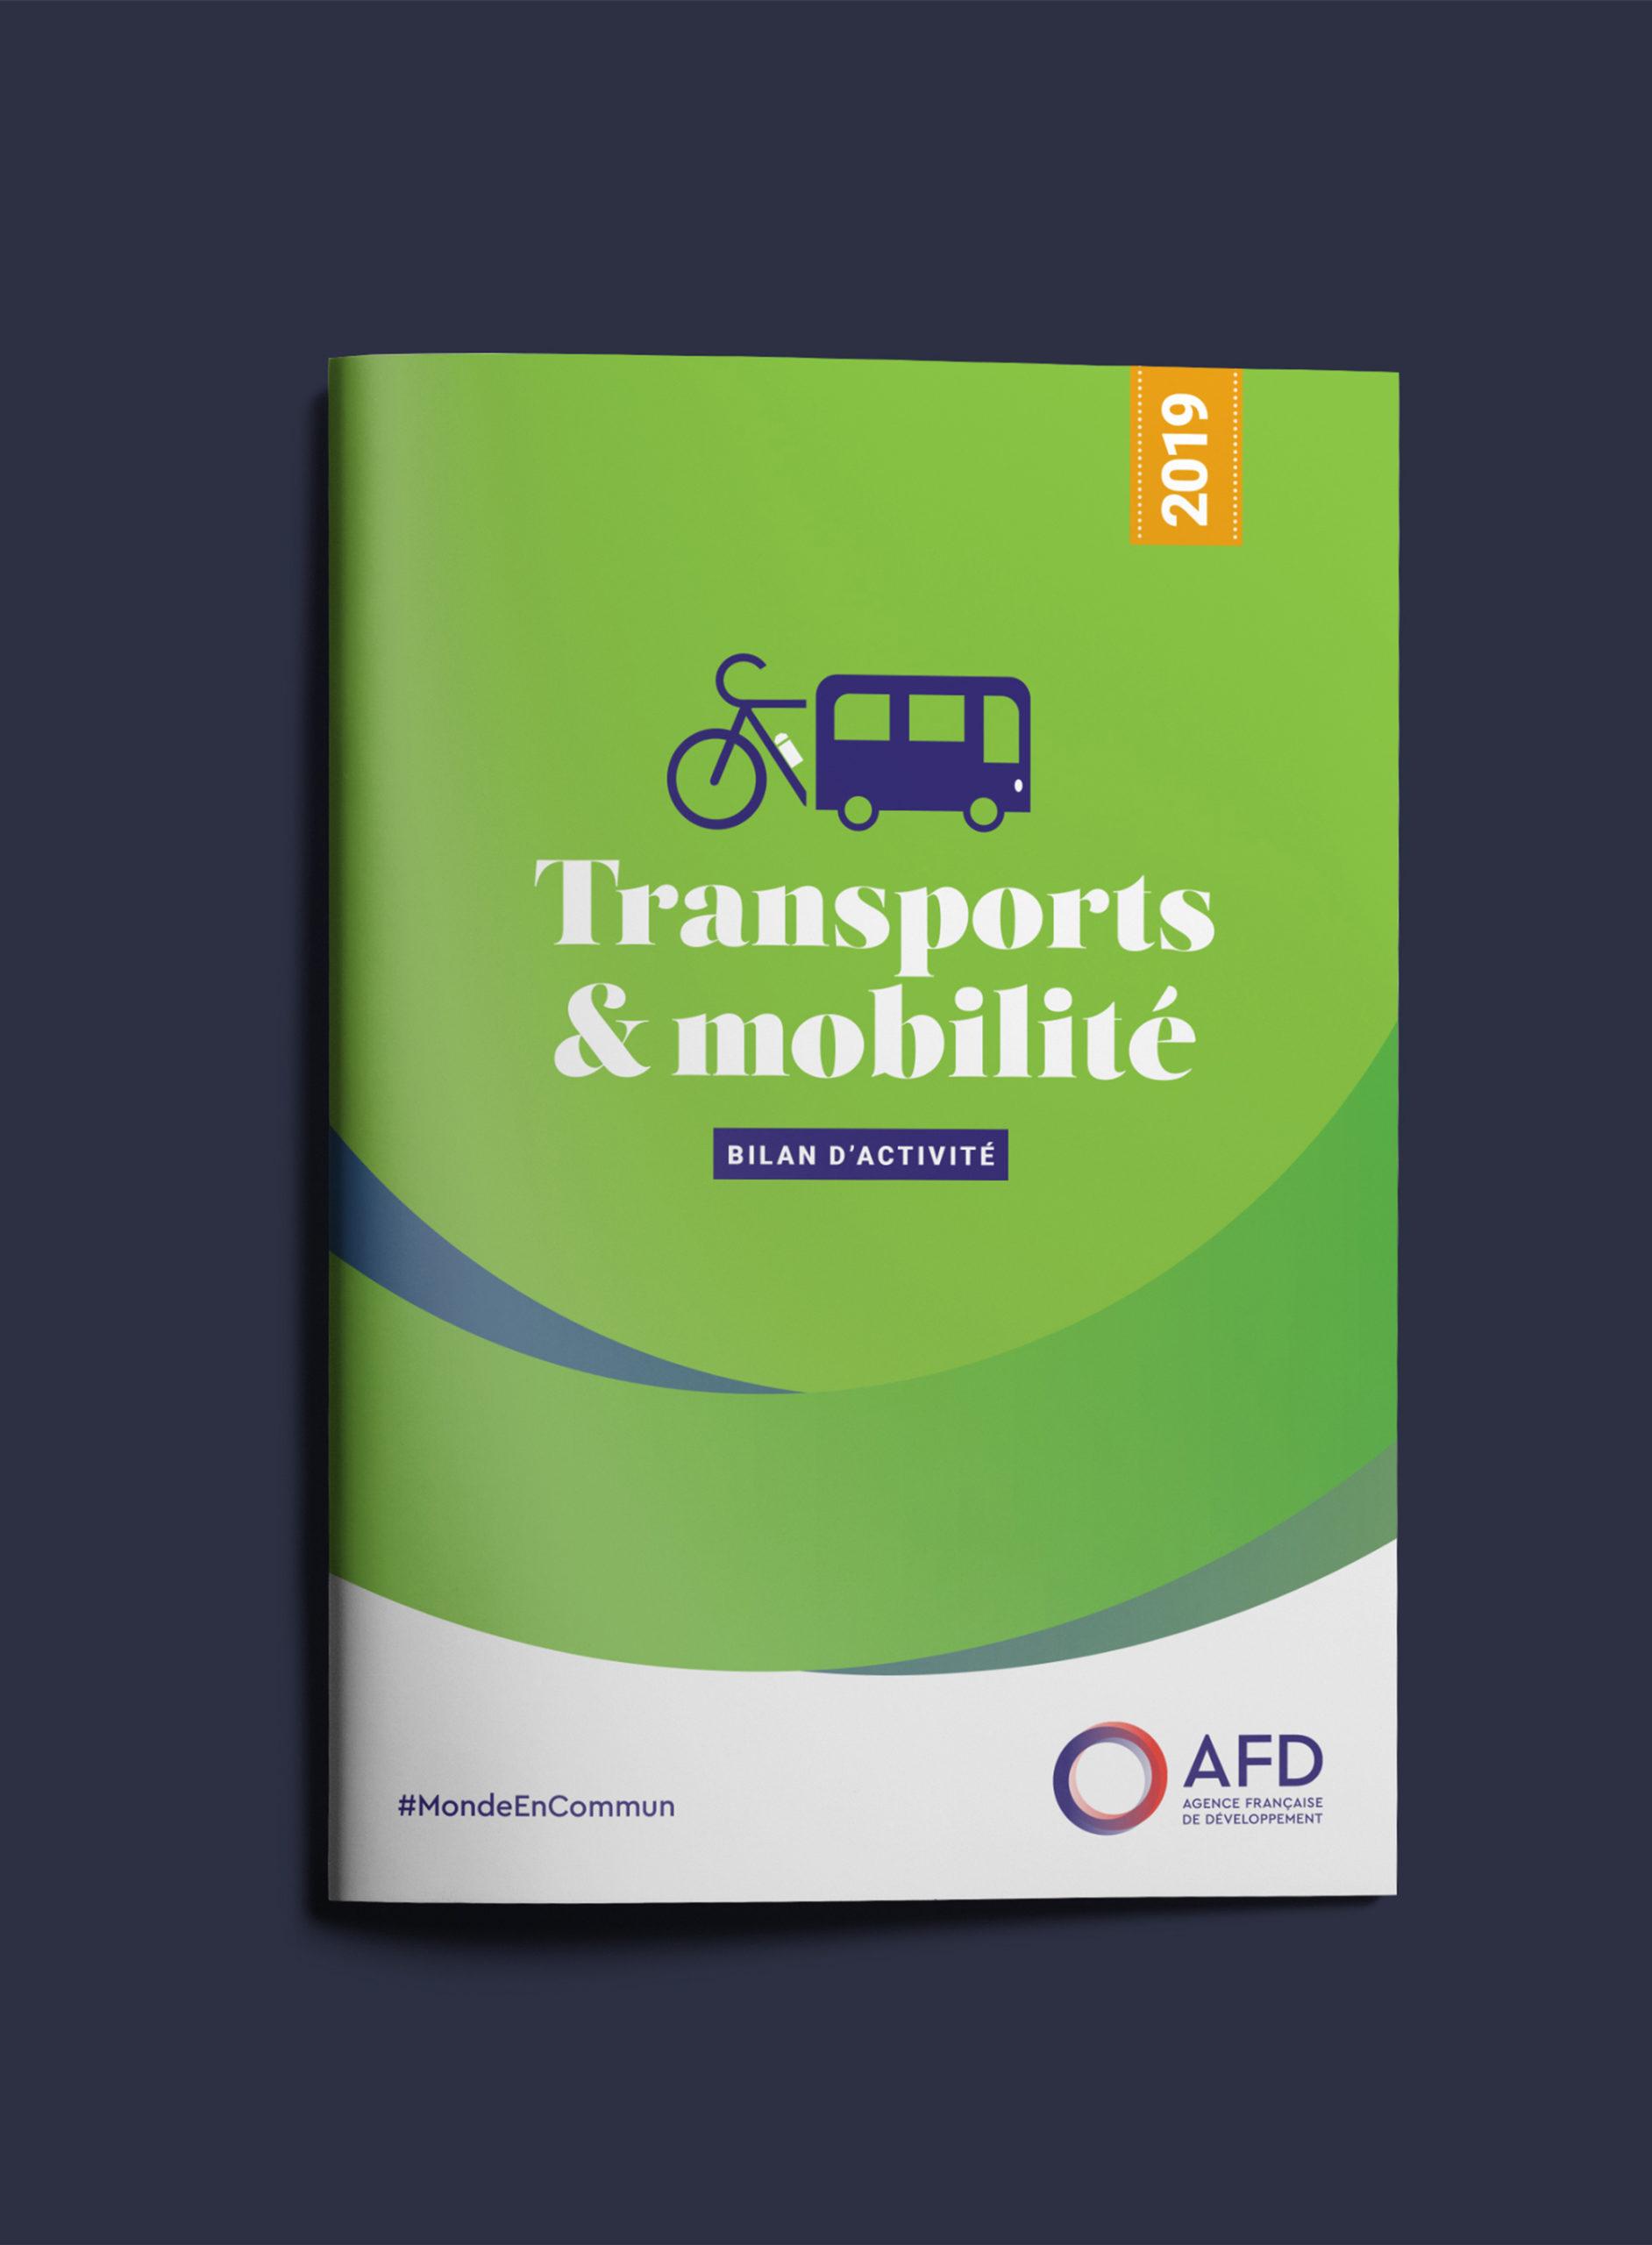 Edition AFD bilan transports